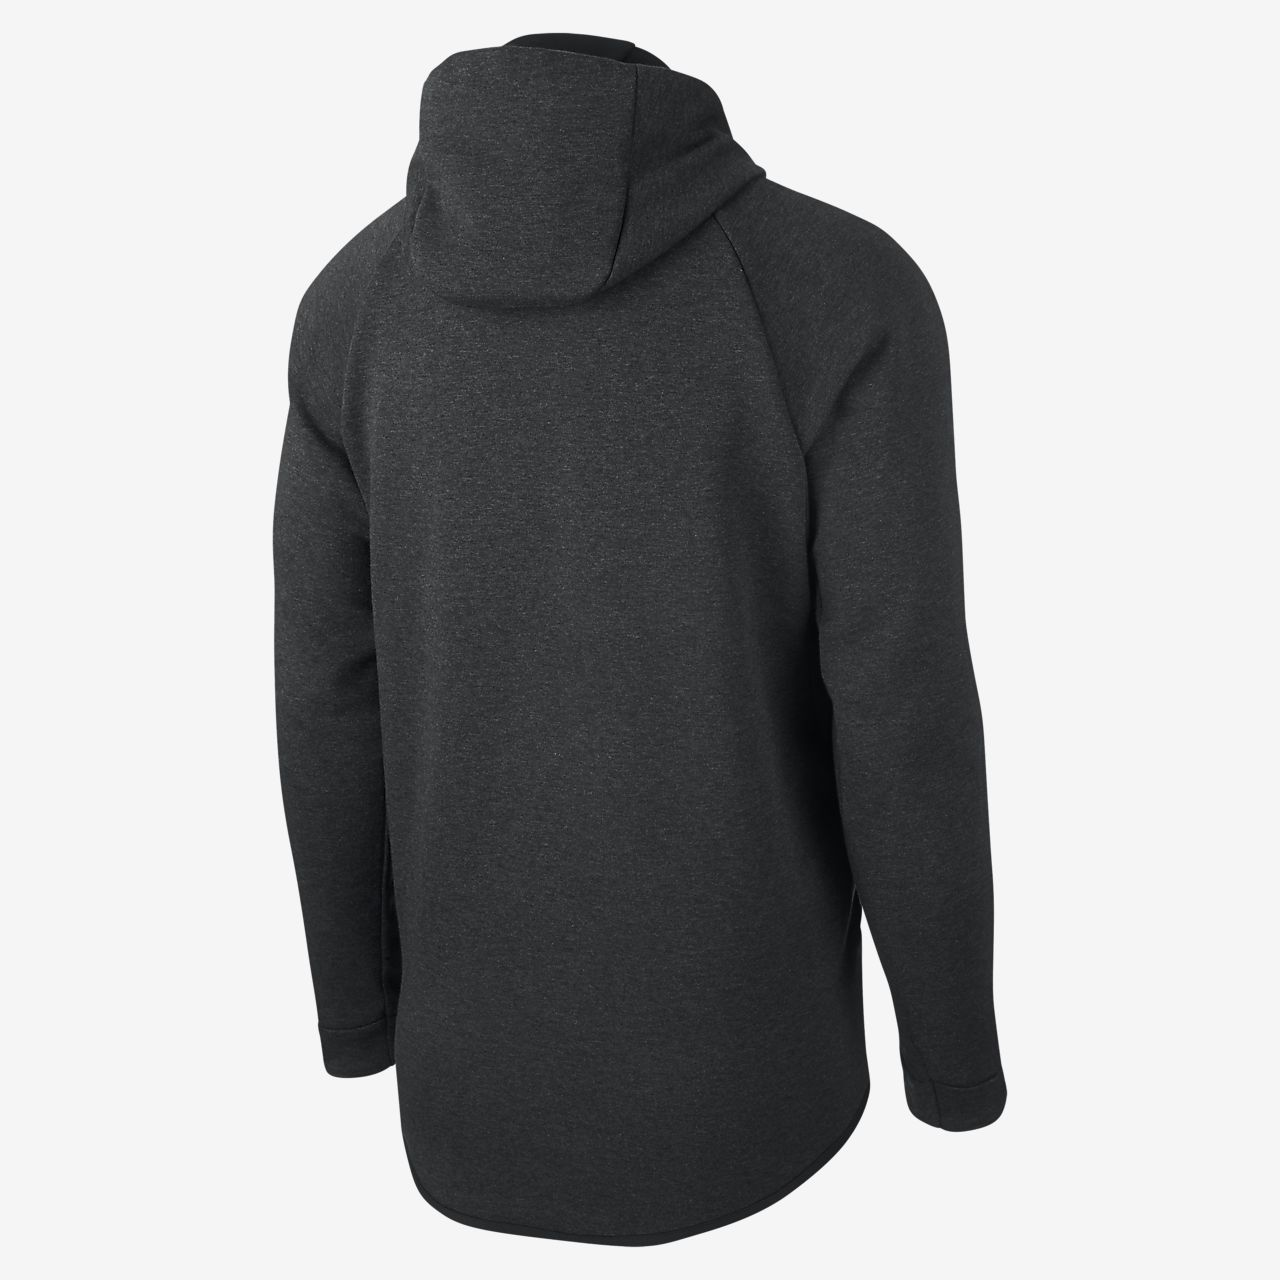 ... A.S. Roma Tech Fleece Windrunner Men's Jacket